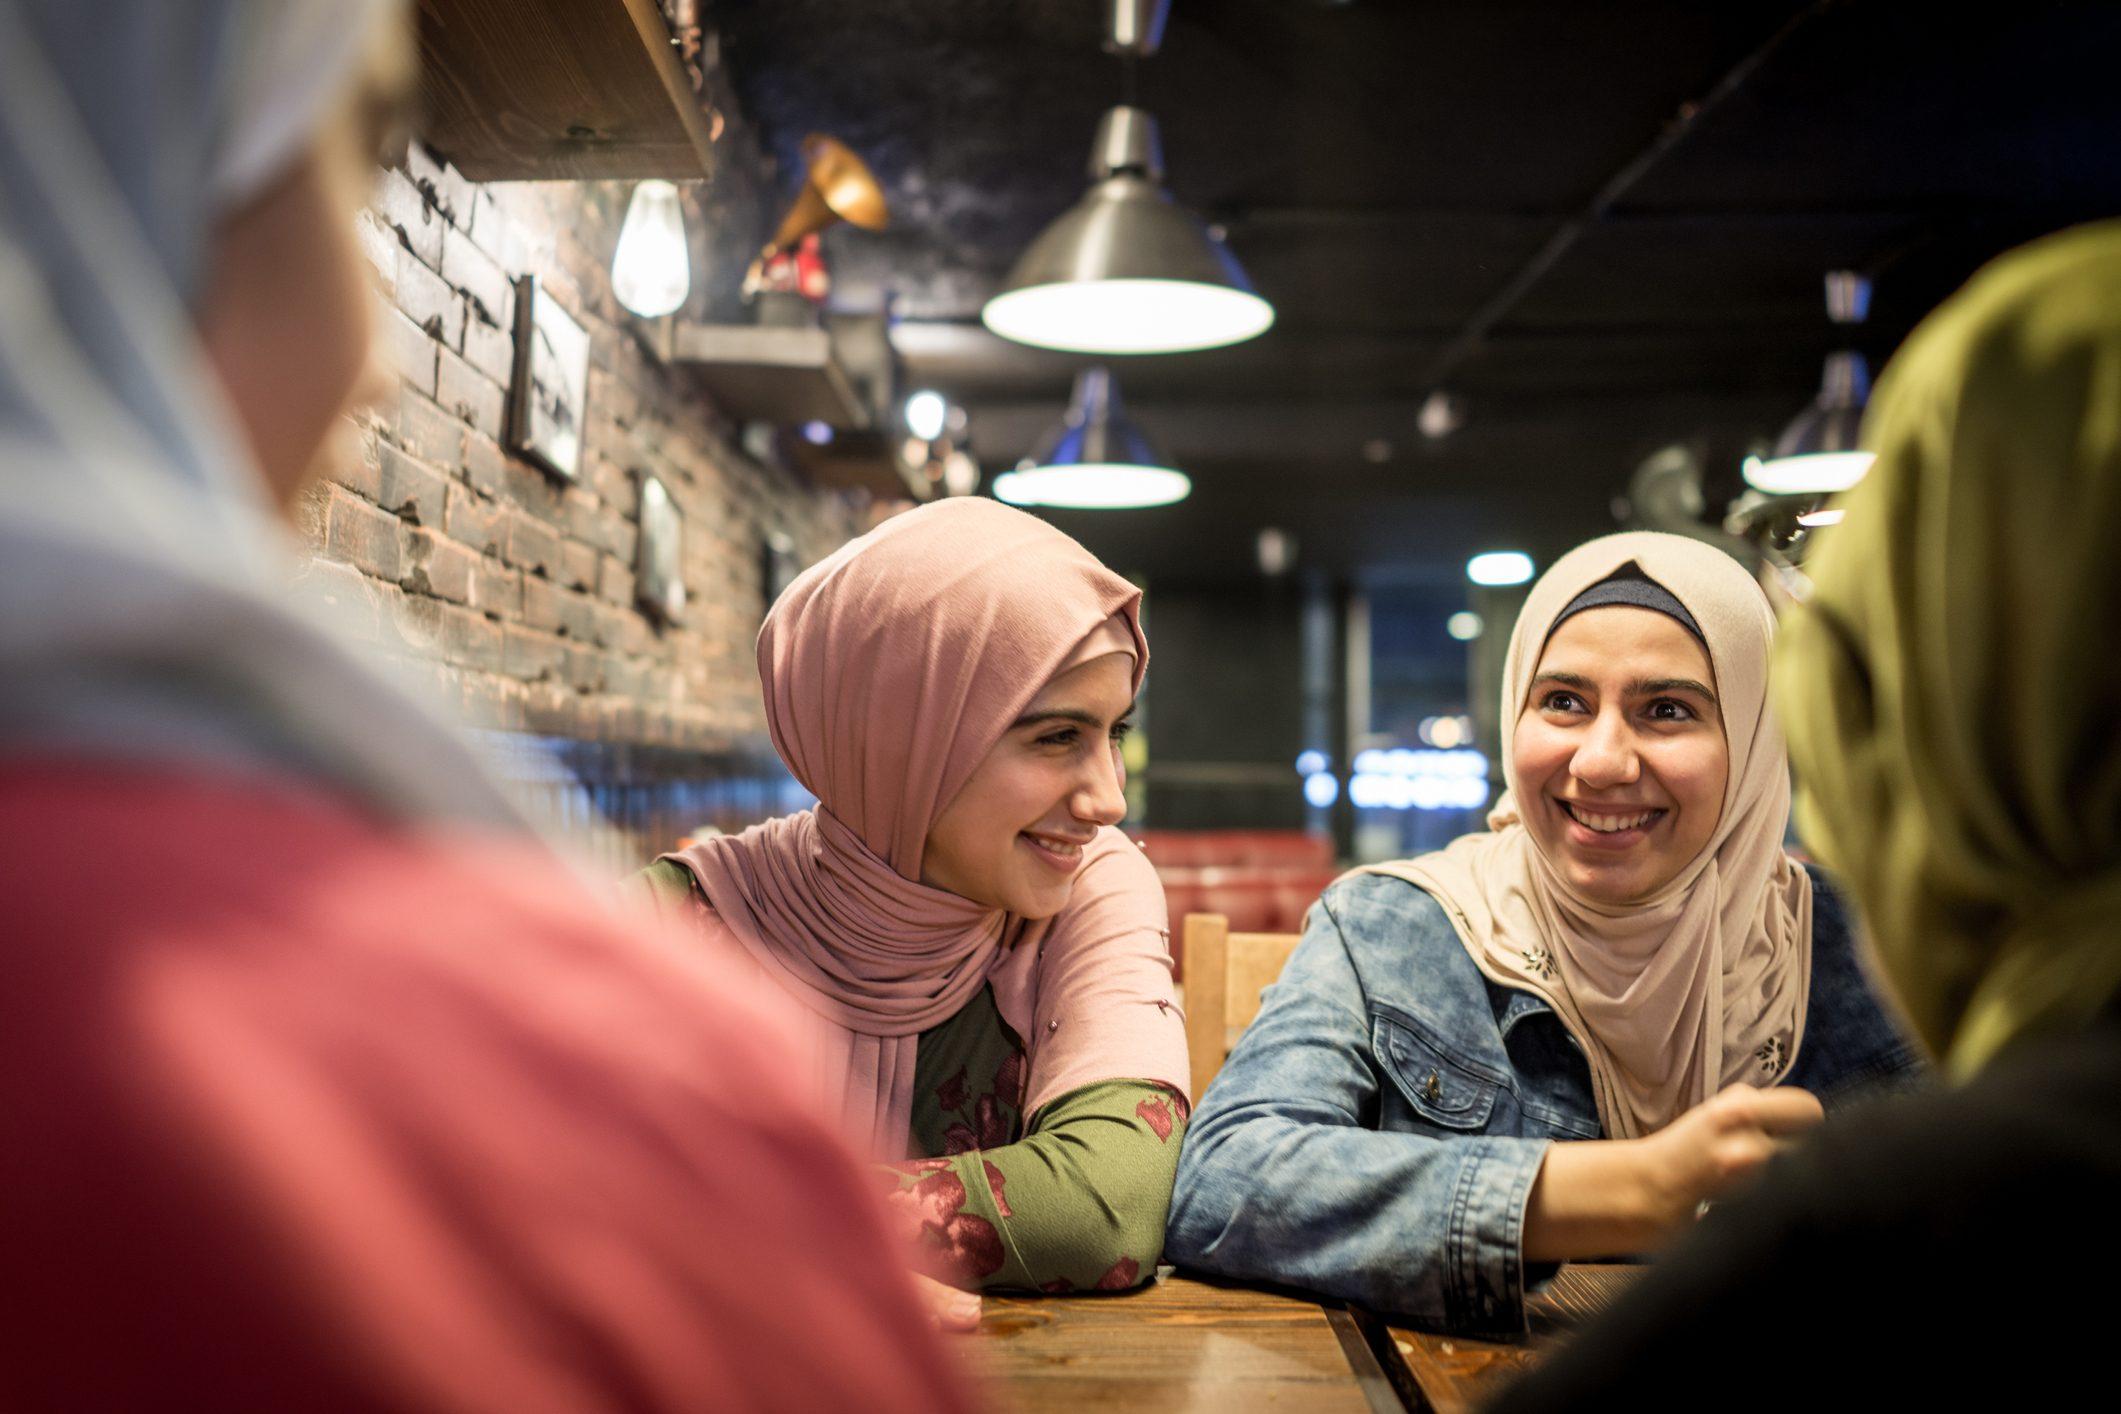 Arab teenage girls having fun together in restaurant